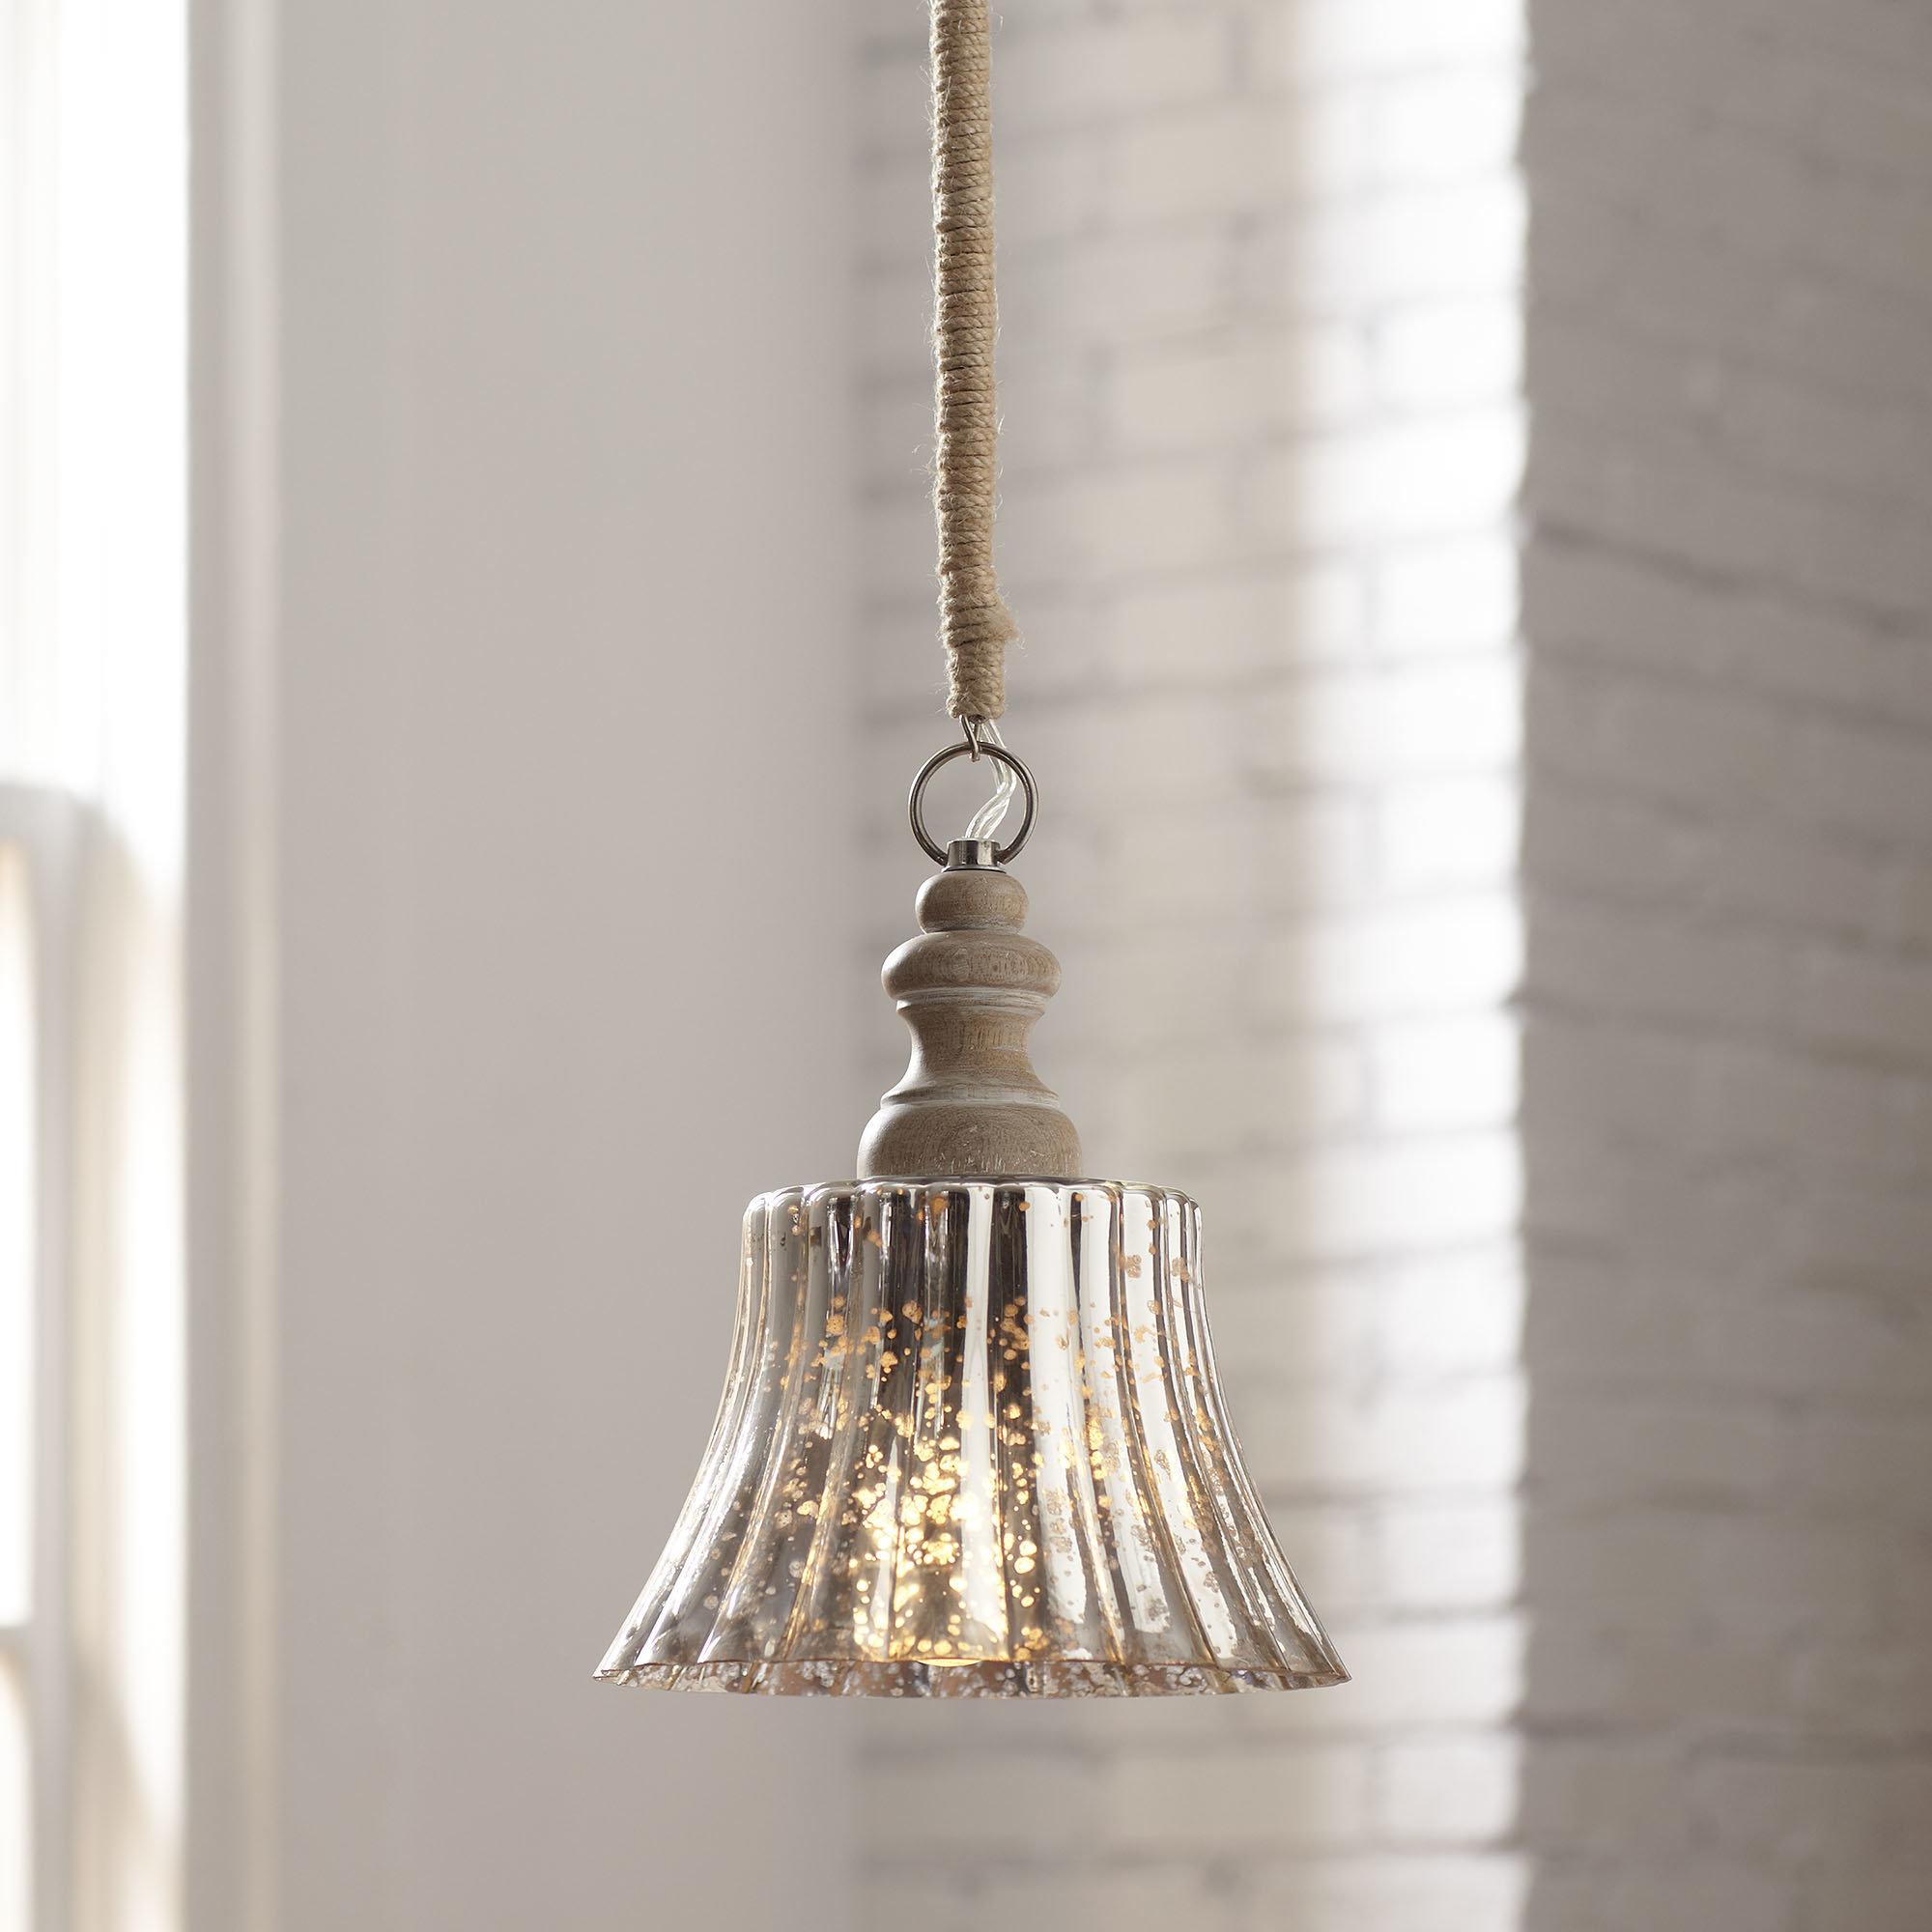 Klas 1-Light Bell Pendant throughout Akakios 1-Light Single Bell Pendants (Image 15 of 30)